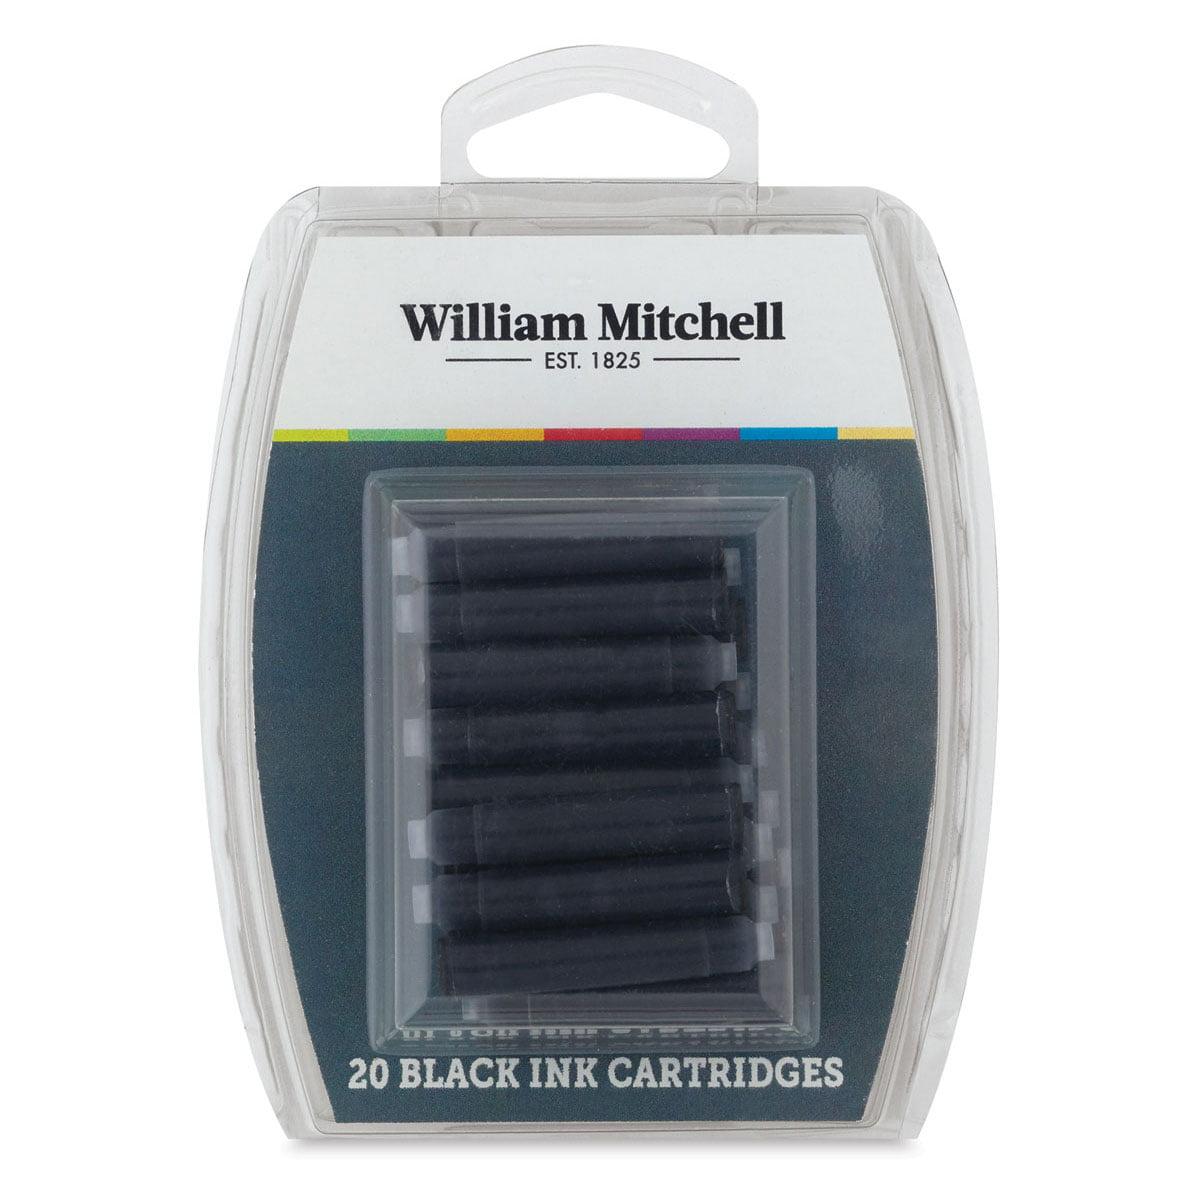 William Mitchell Universal Black Ink Calligraphy Cartridges